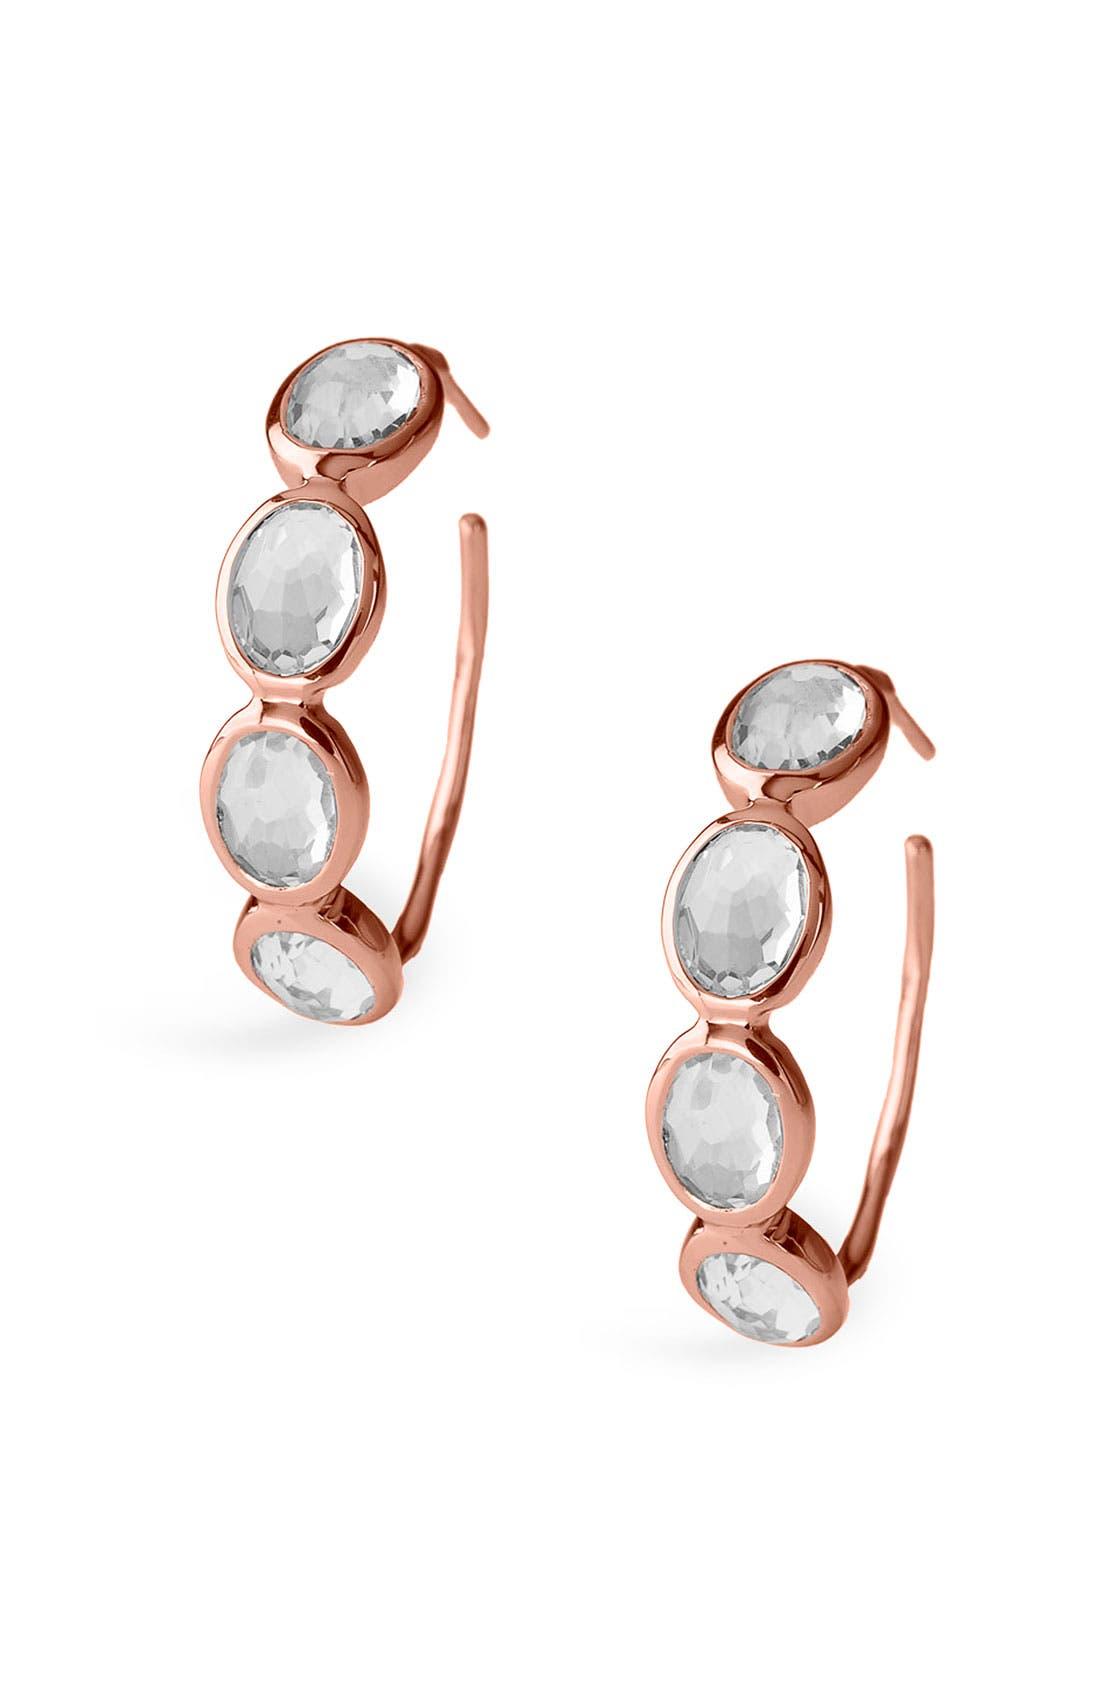 Main Image - Ippolita 'Rock Candy - Number 2' Rosé 4-Stone Hoop Earrings